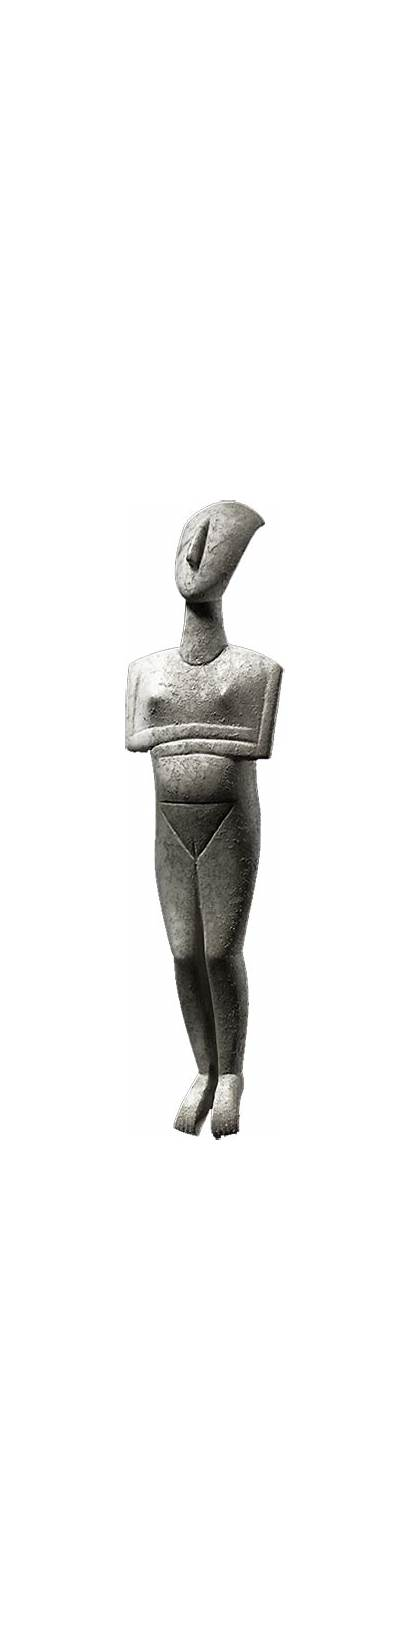 Cycladic Sculptures Sculpture Greece Islands Figurines Neolithic